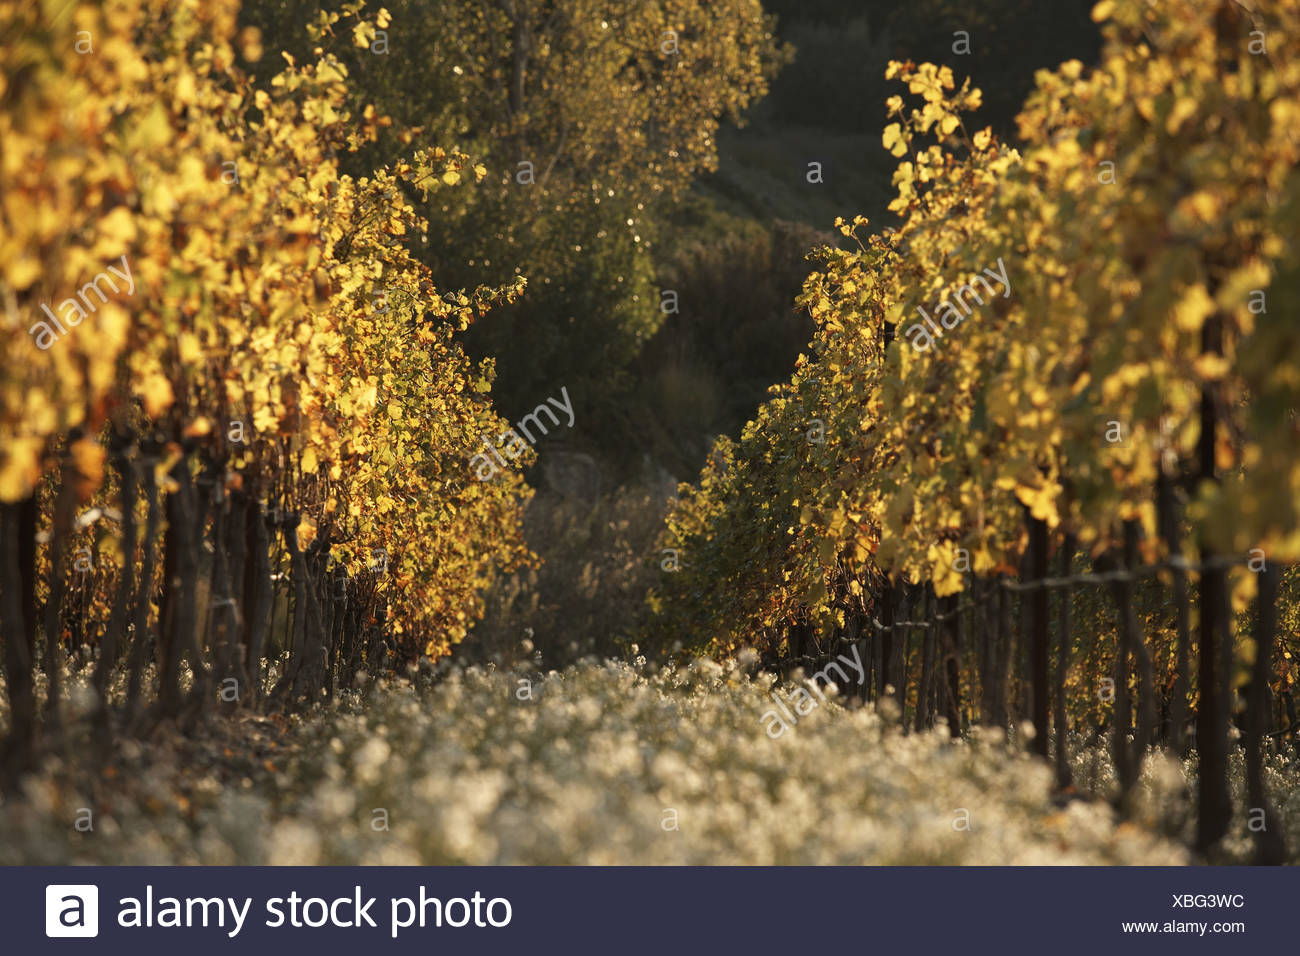 Côtes-du-Rhône vinyard - Stock Image